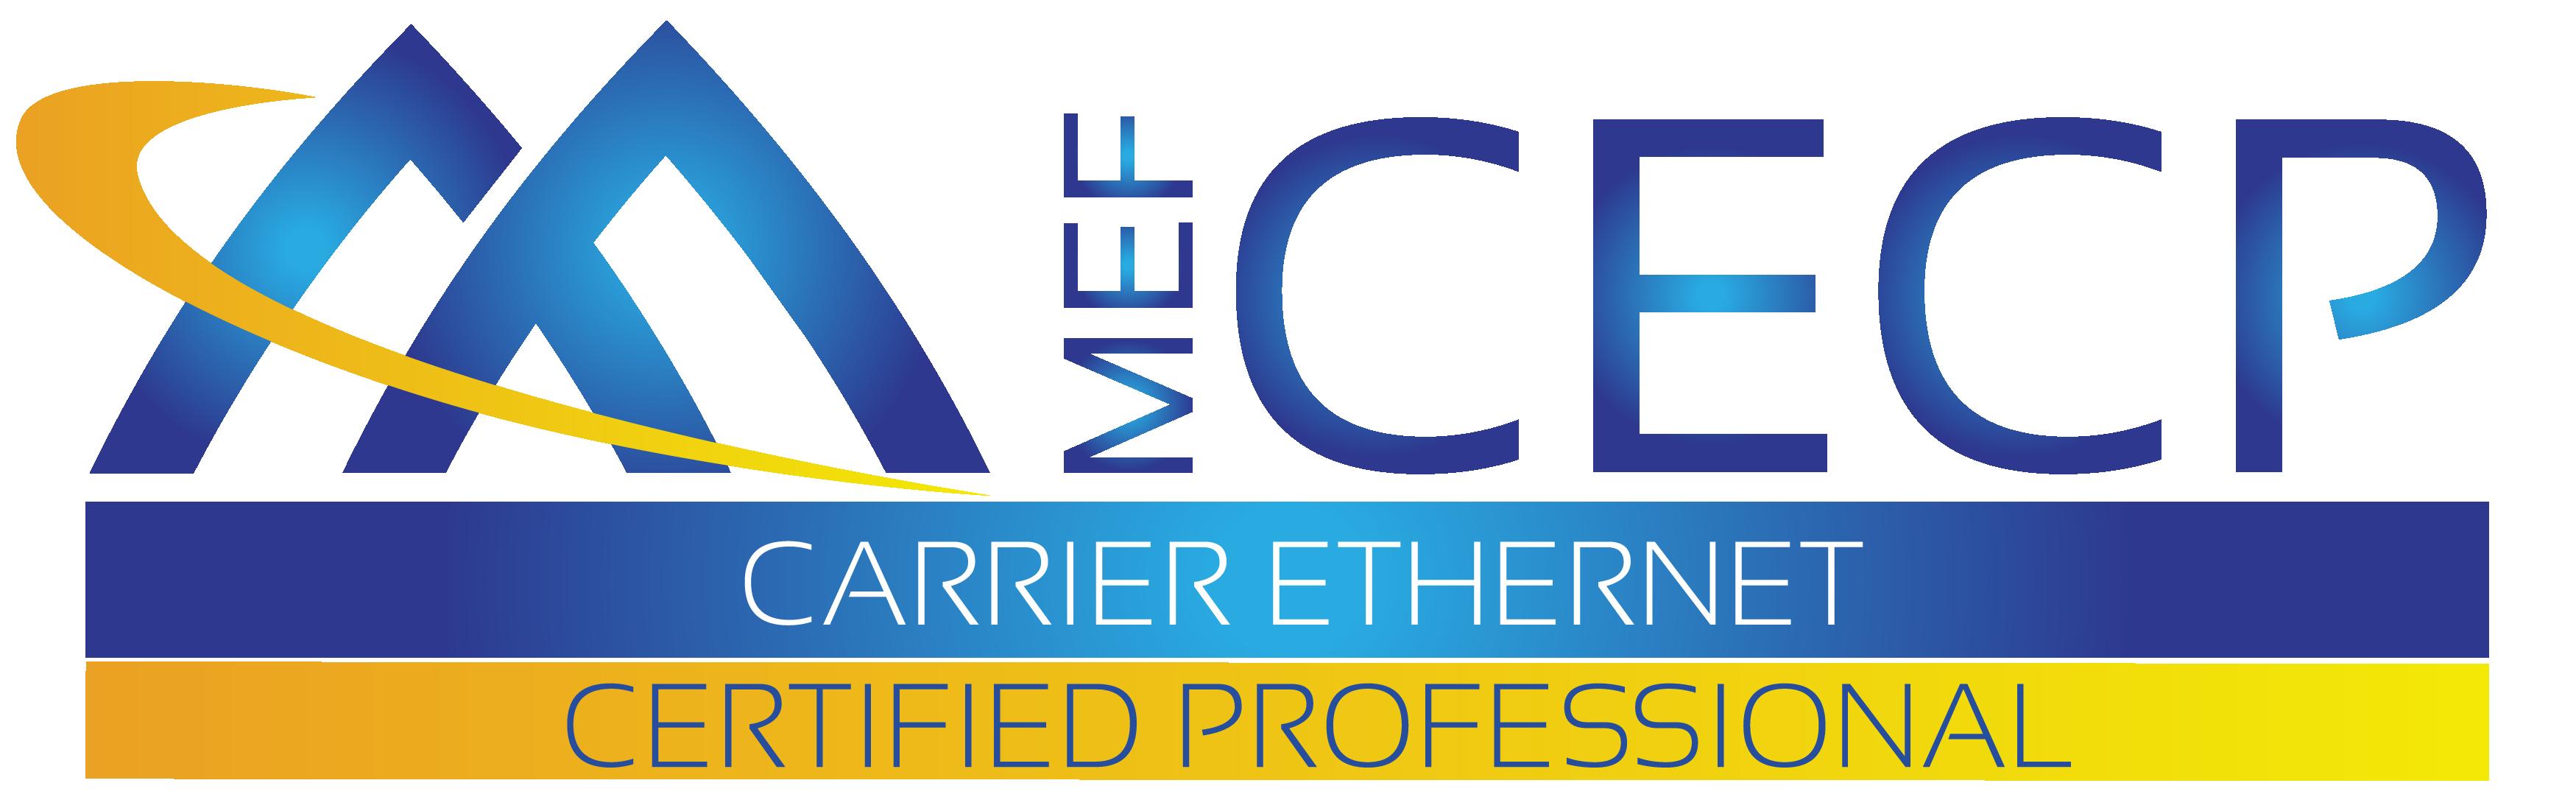 MEF-CECP-Logo